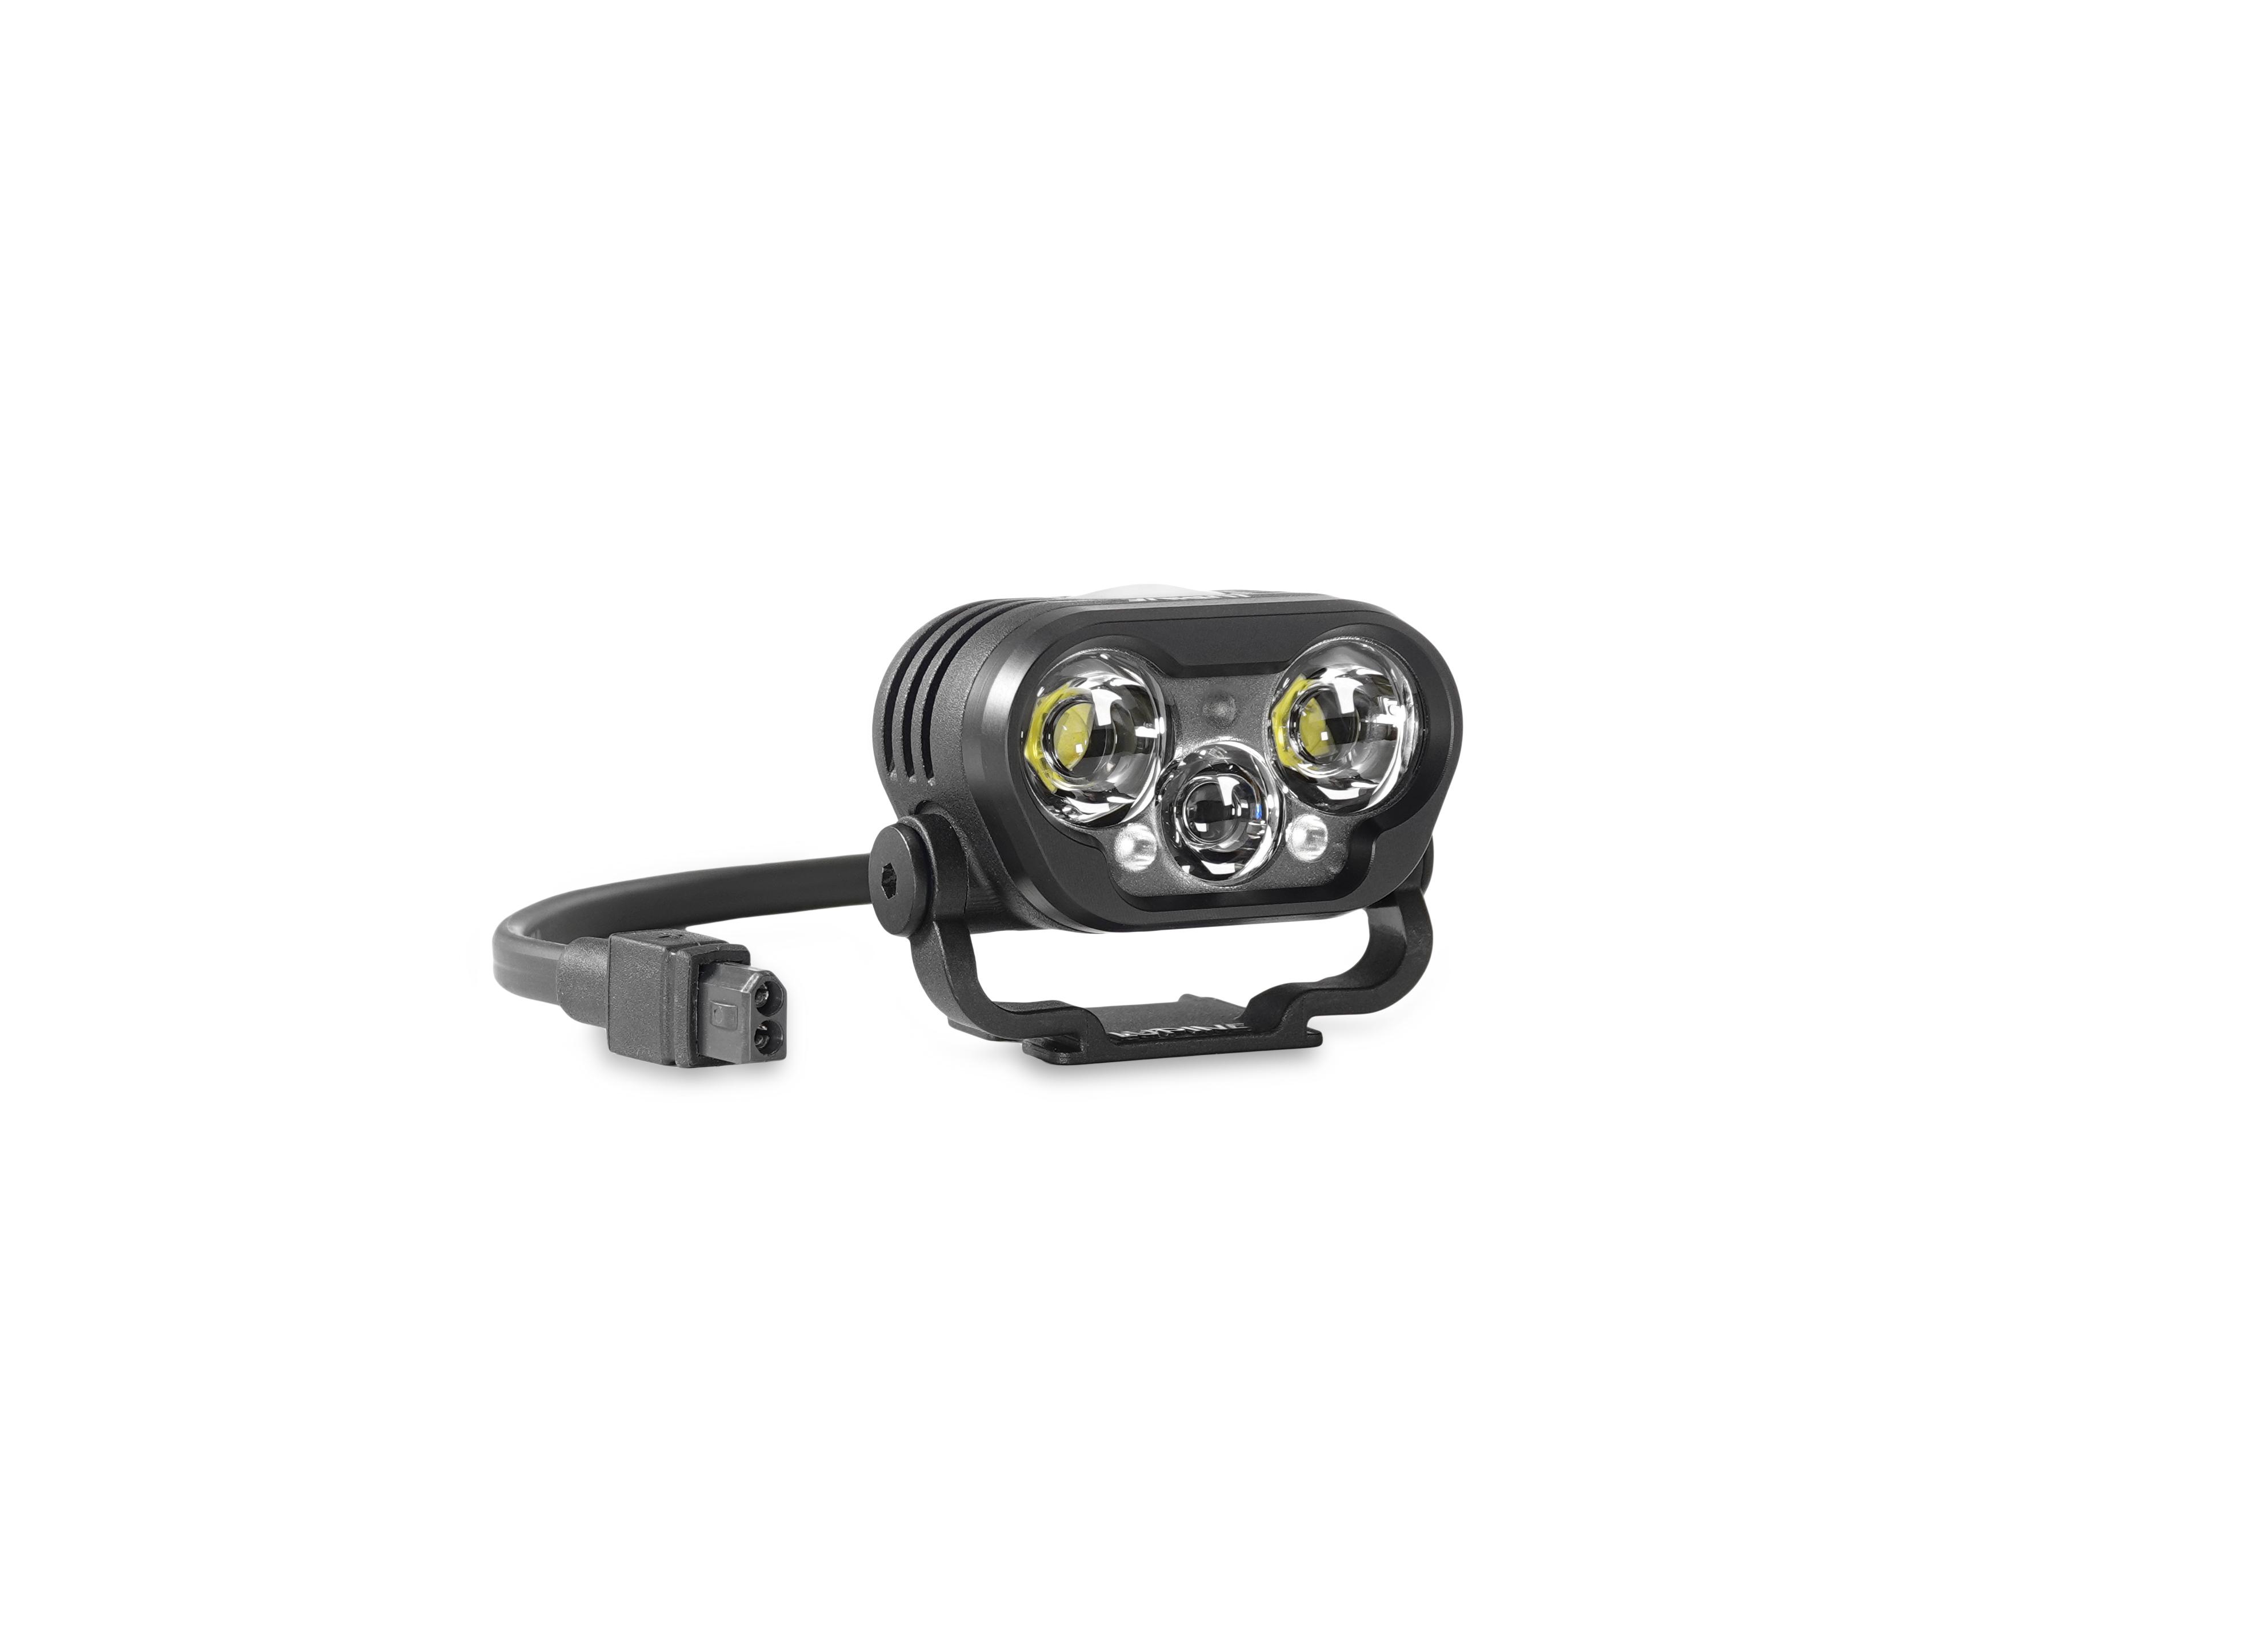 Blika Lampenkopf (mit/ohne Bluetooth)